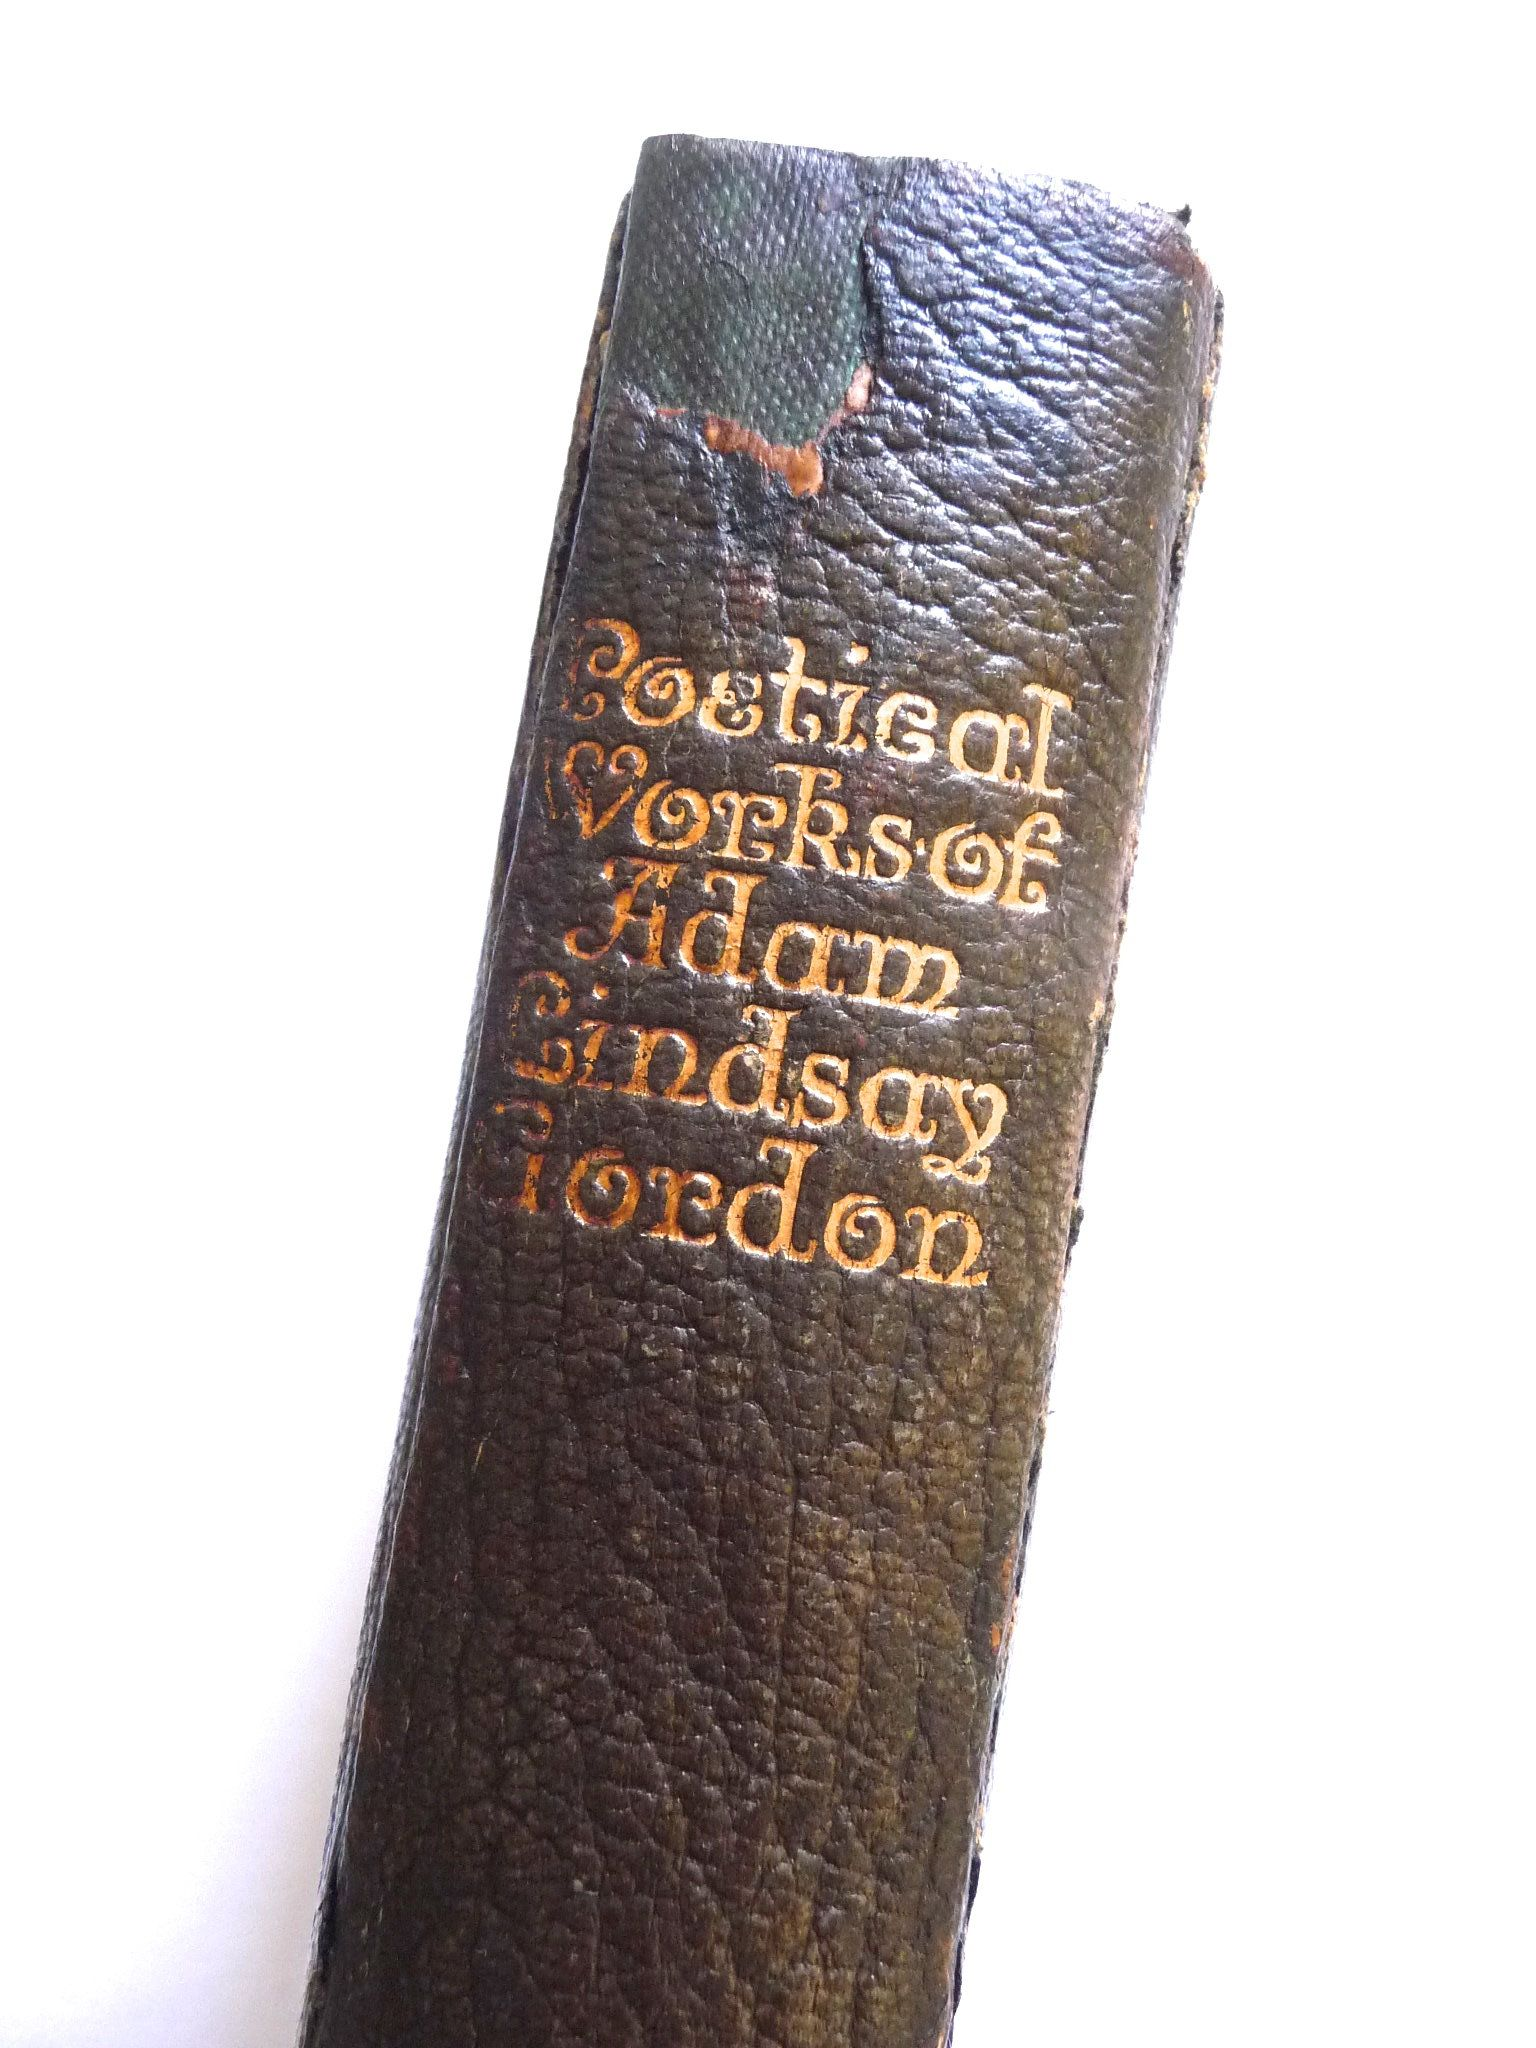 Poetical Works of Adam Lindsay Gordon 1913 Edition